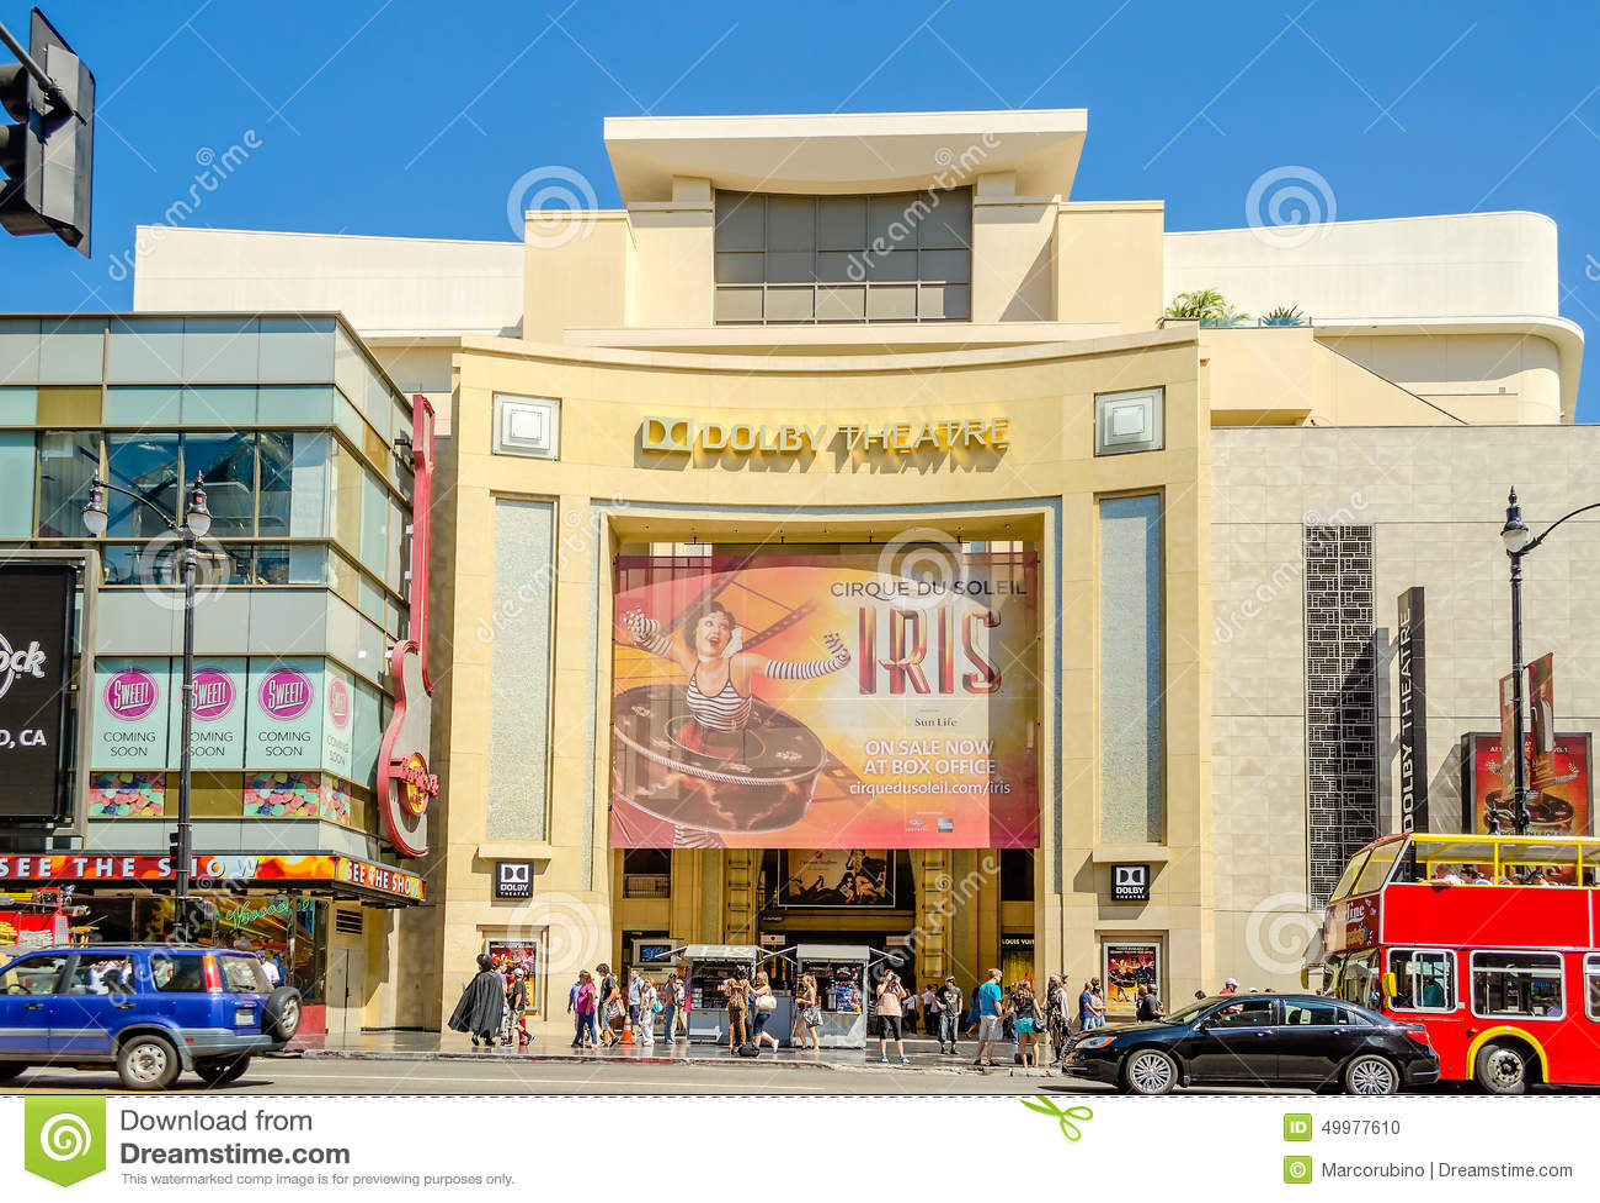 Dolby Theatre w Hollywood bulwarze, Los Angeles